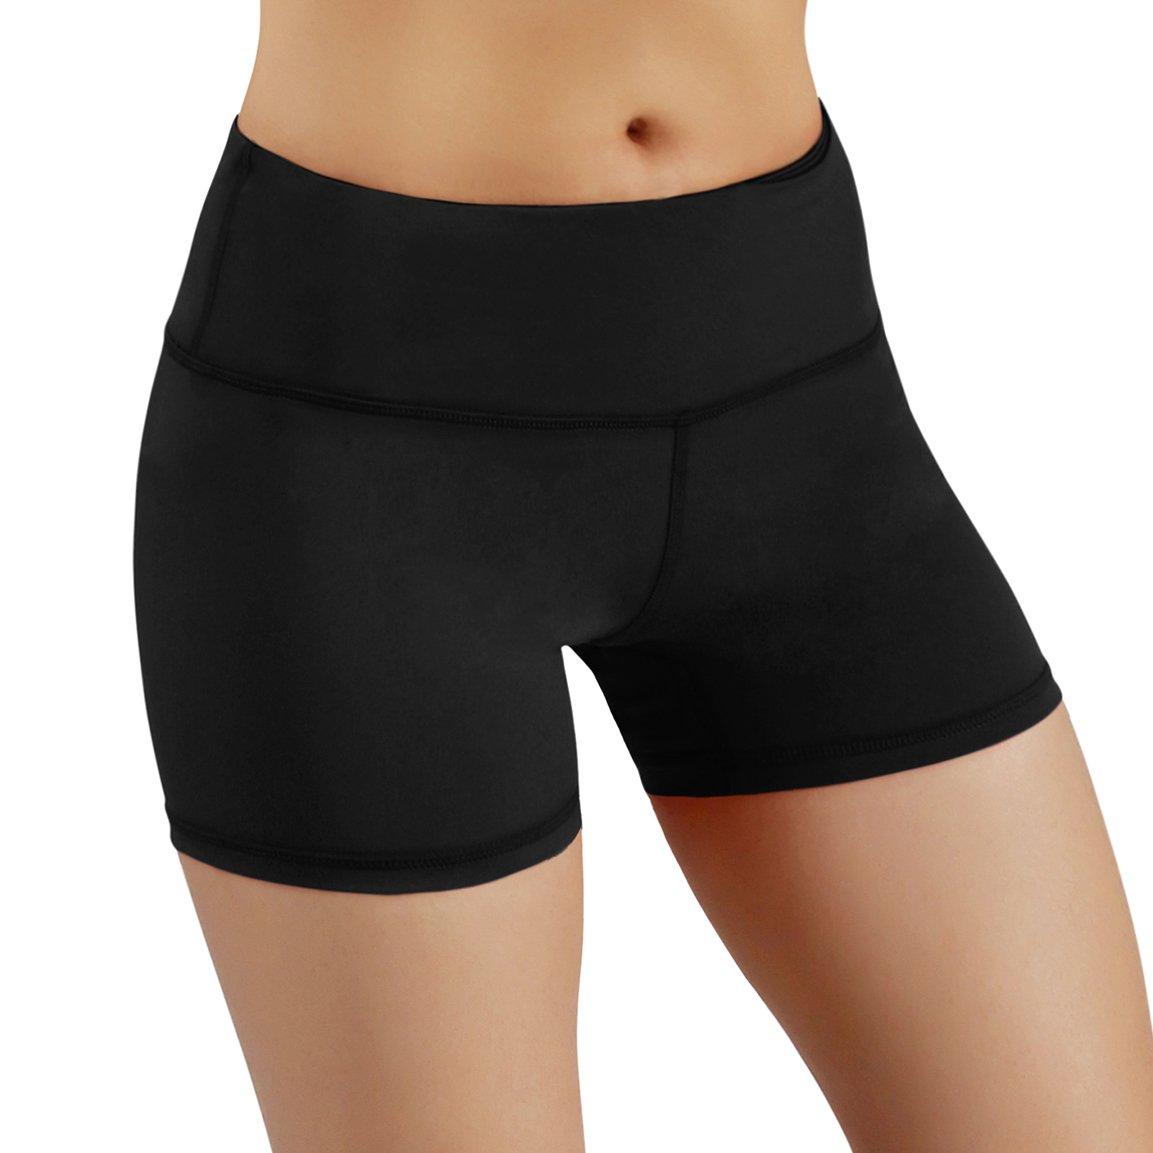 ODODOS Power Flex Yoga Short Tummy Control Workout Running Athletic Non See-Through Yoga Shorts with Hidden Pocket,Black,Medium